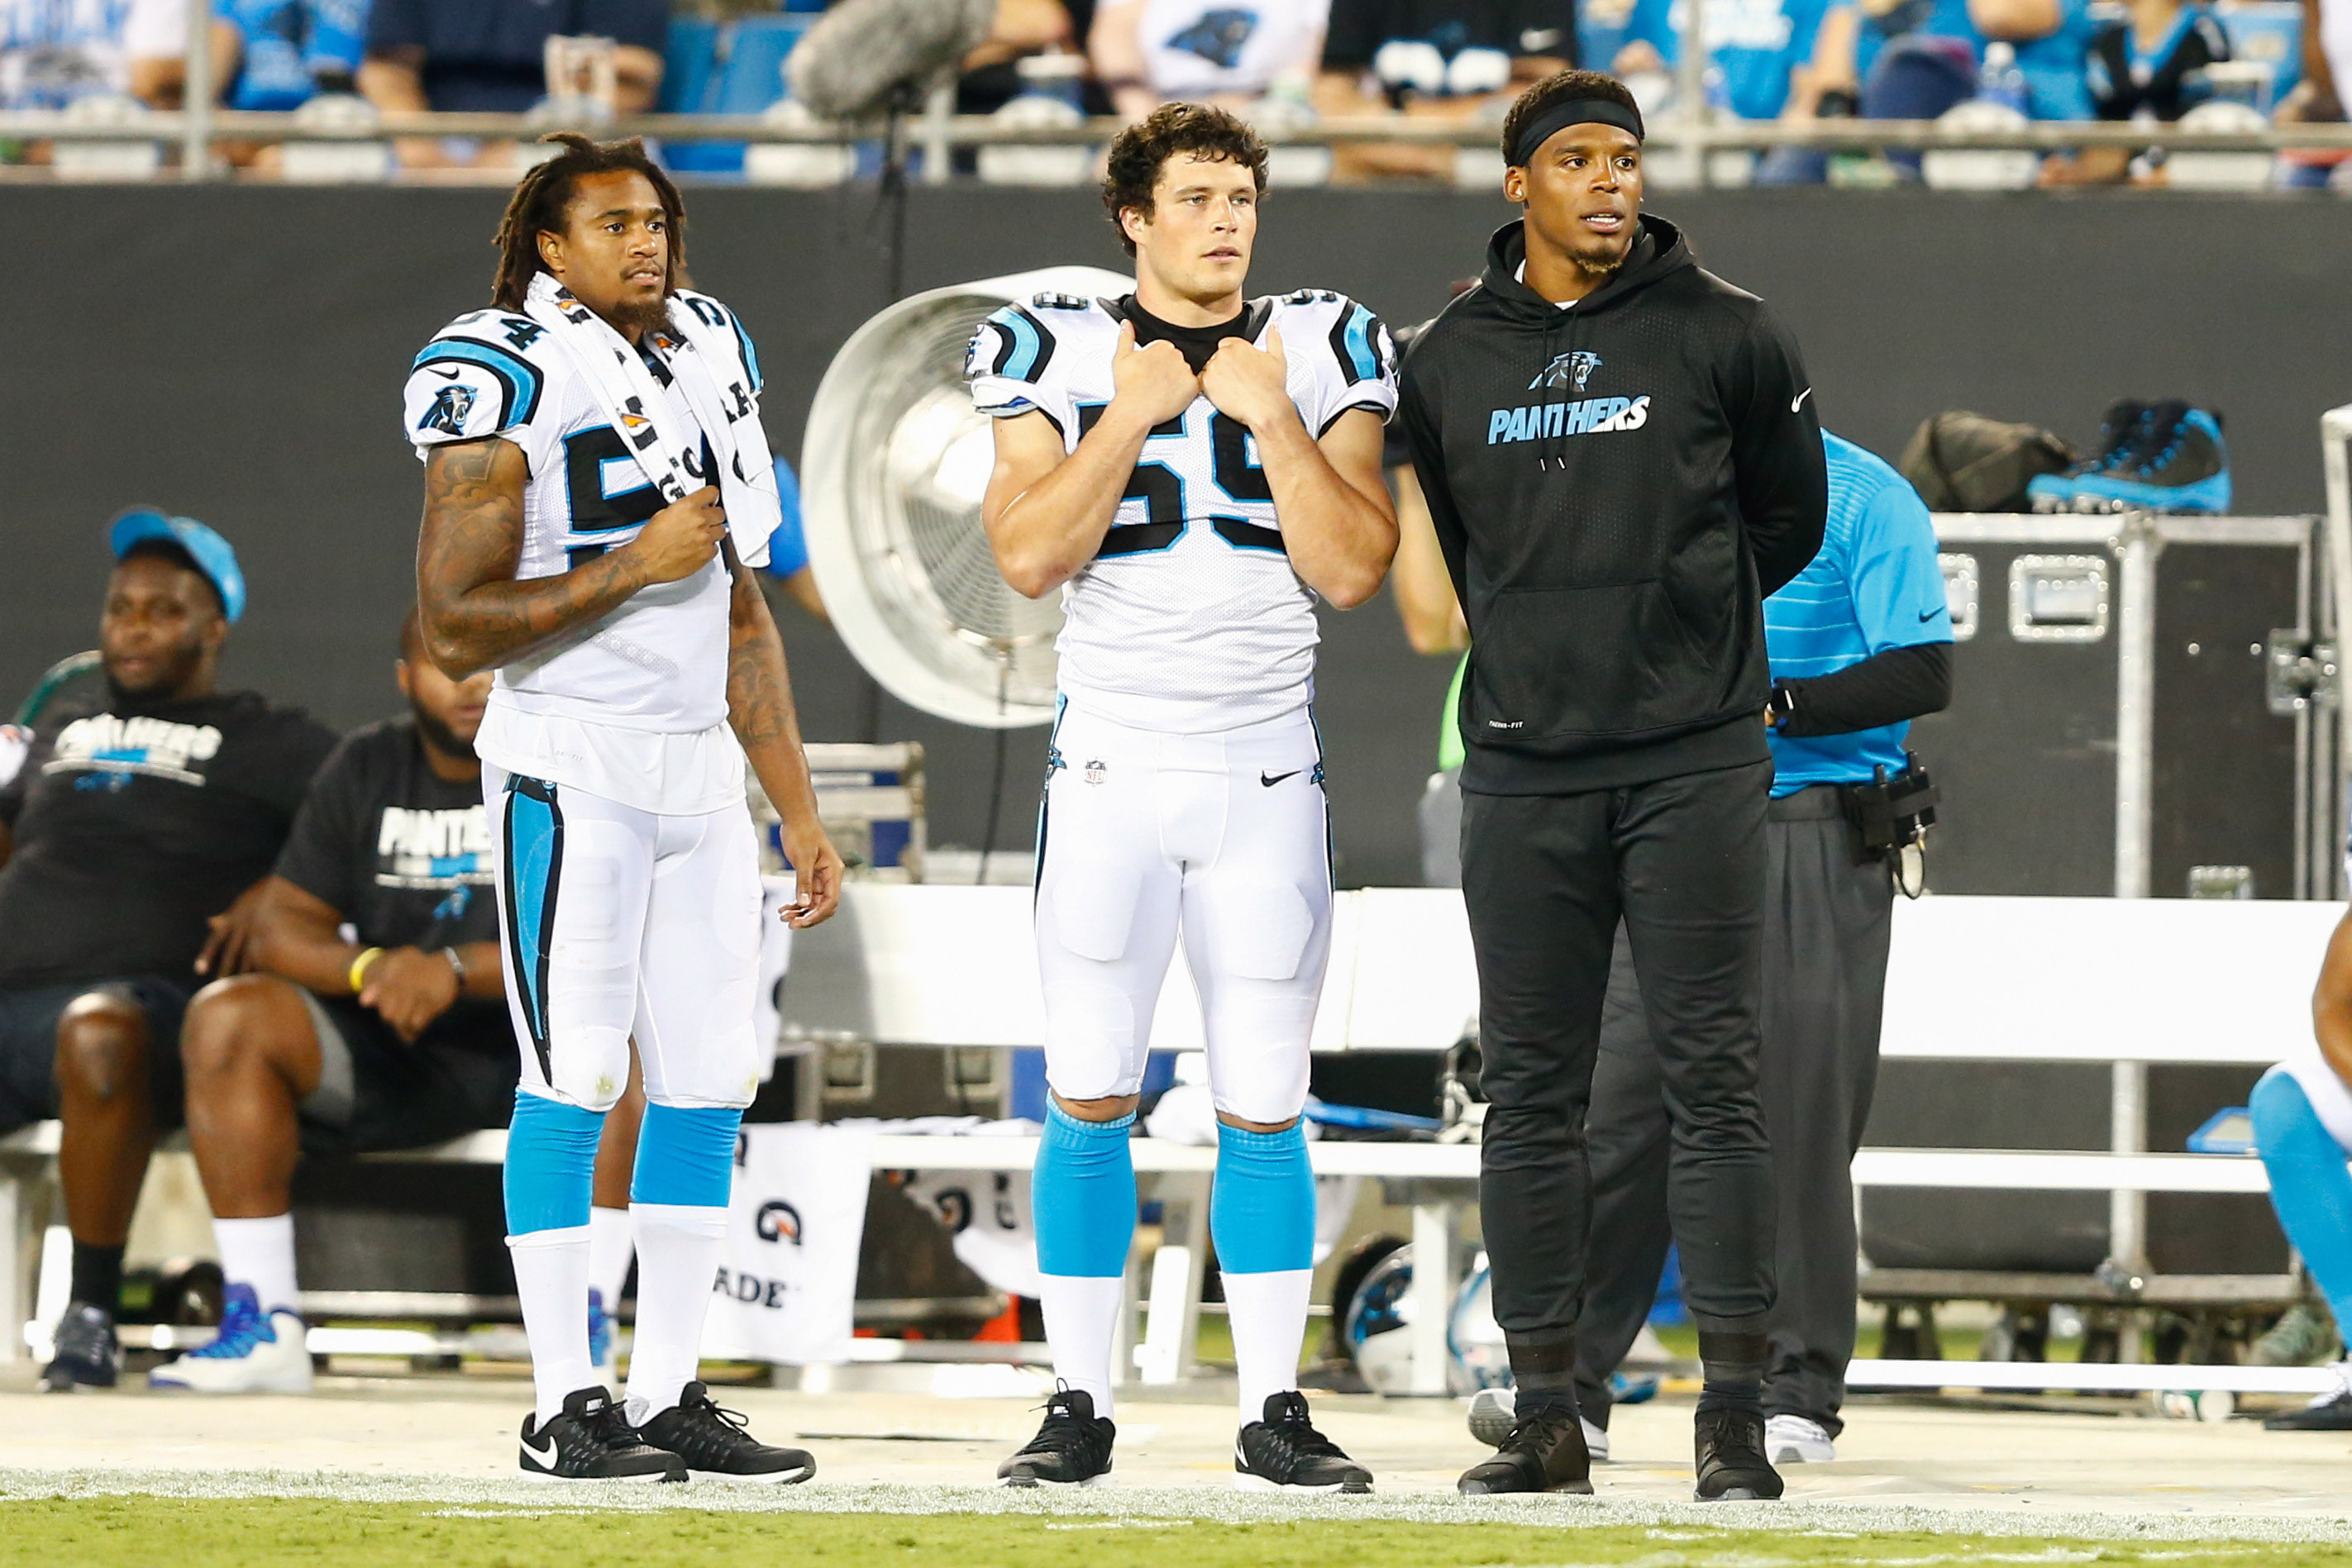 NFL: Houston Texans at Carolina Panthers